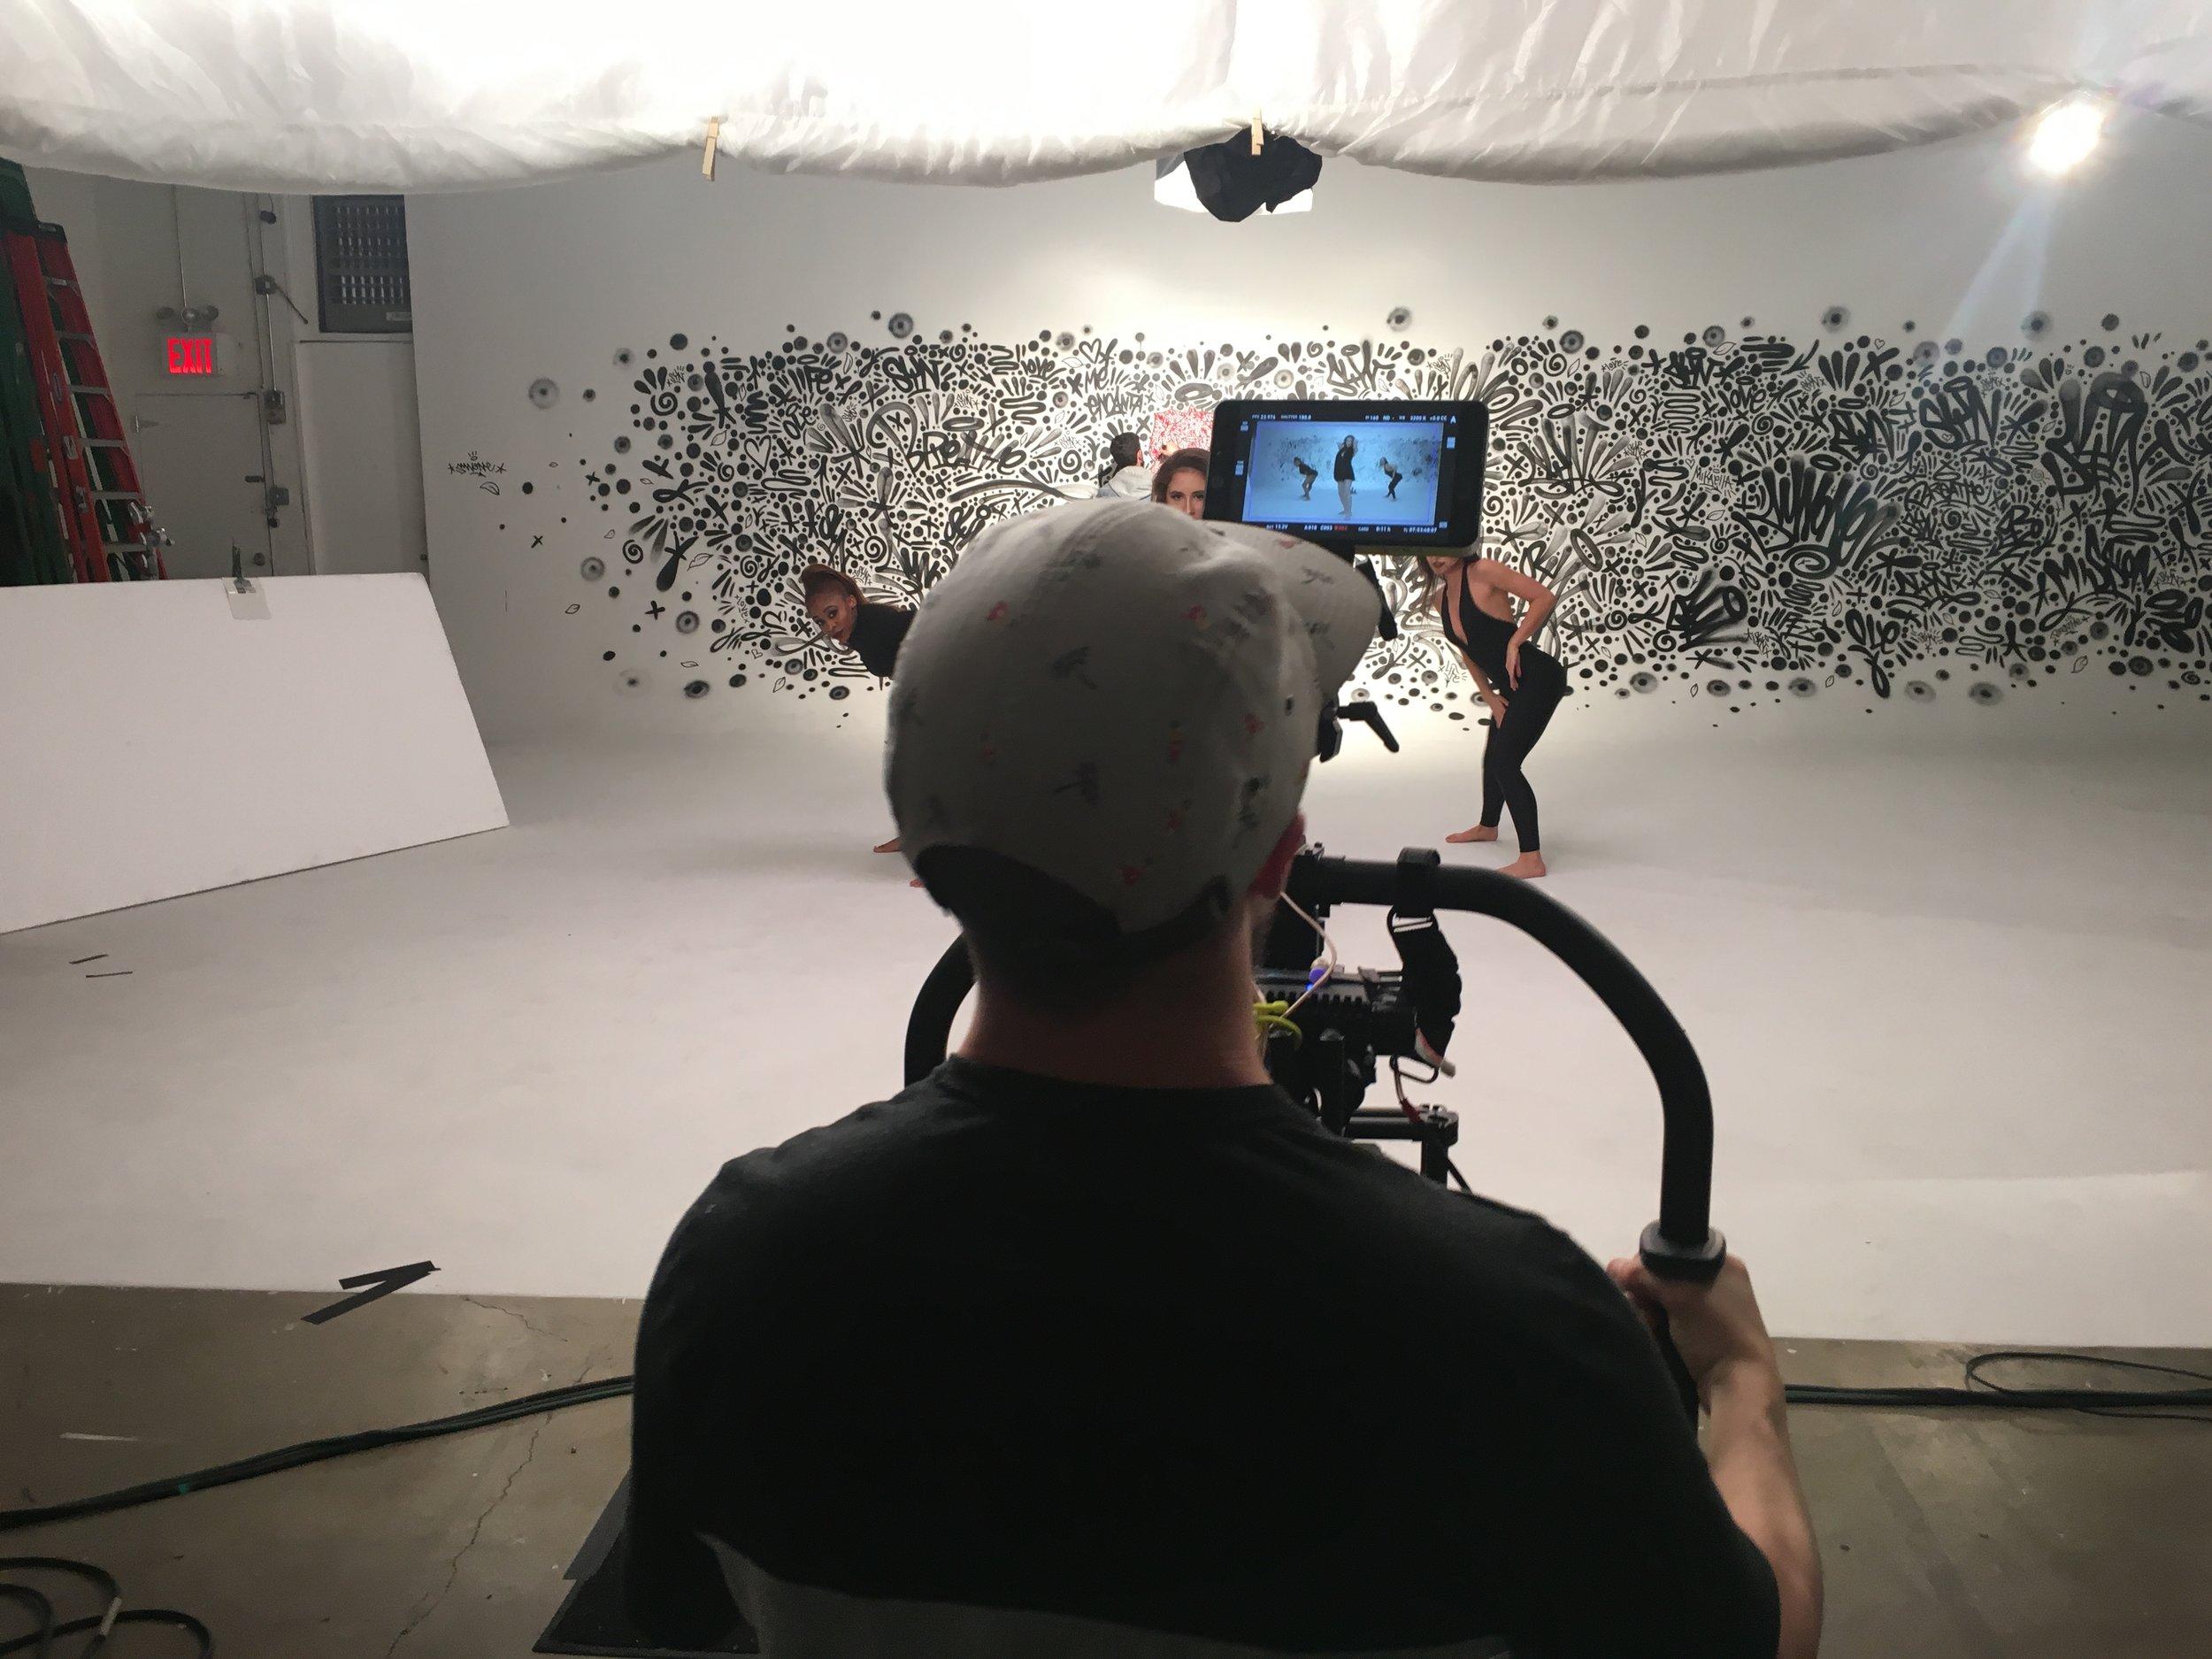 videographer-mikaella-ashley-musicvideo-nycproduction-arri.jpg